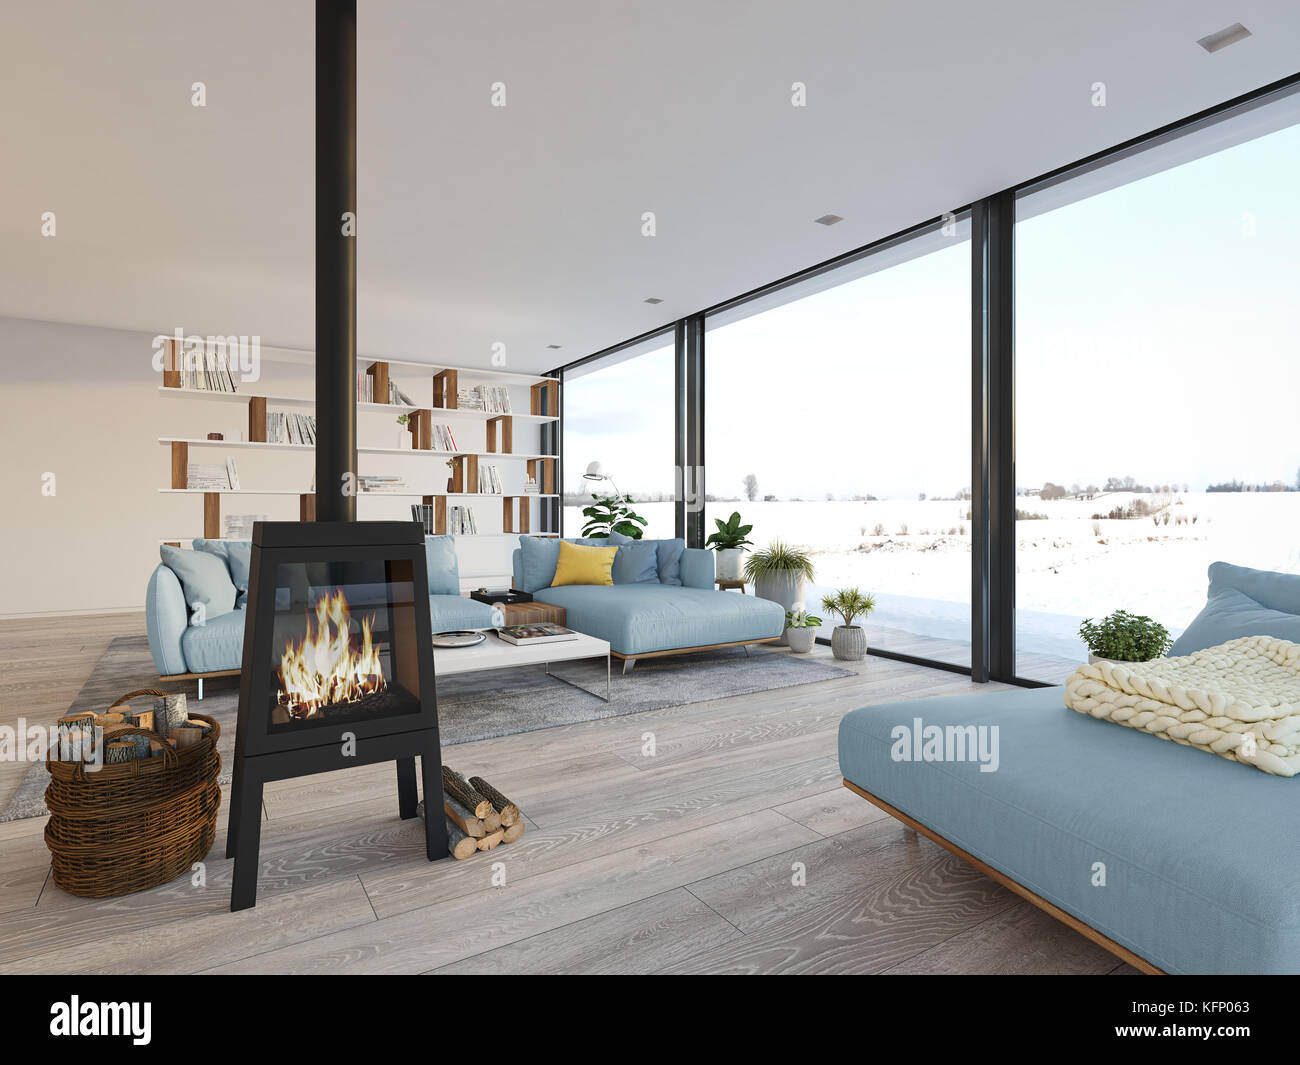 Cheminee Moderne Loft